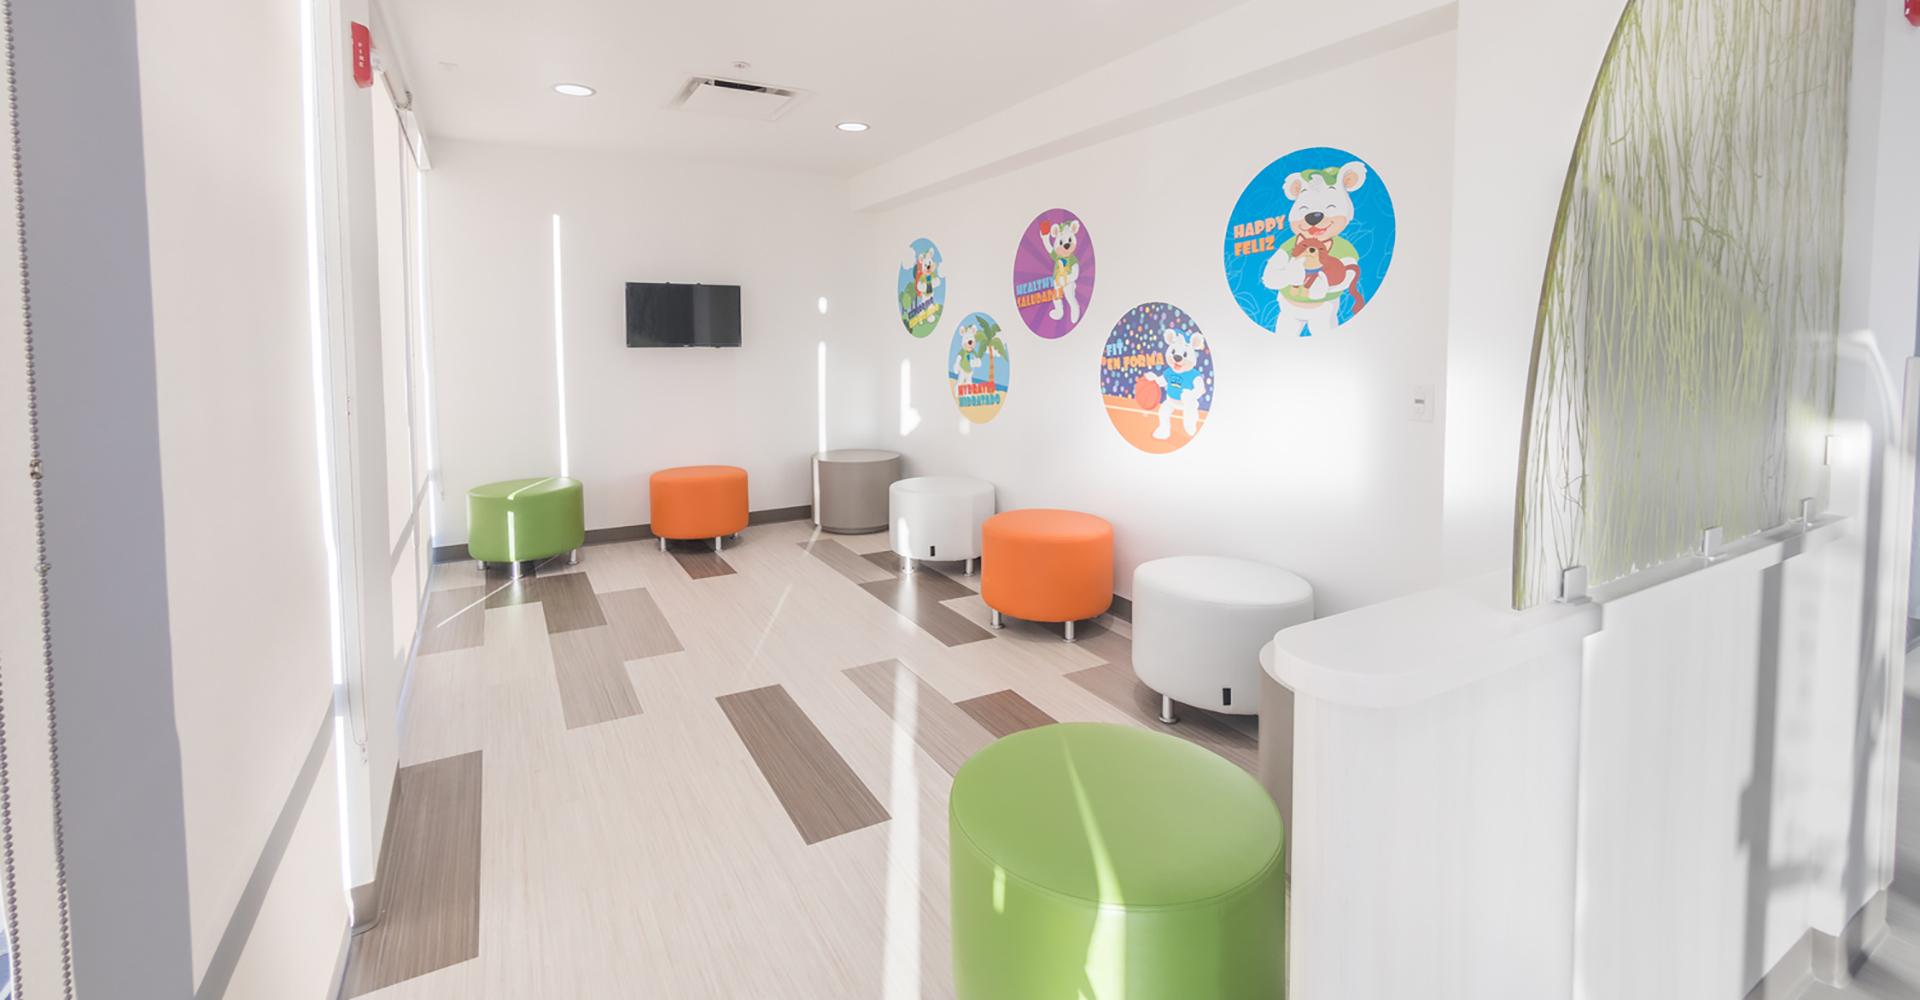 Primary Care Clinics Bear Room.